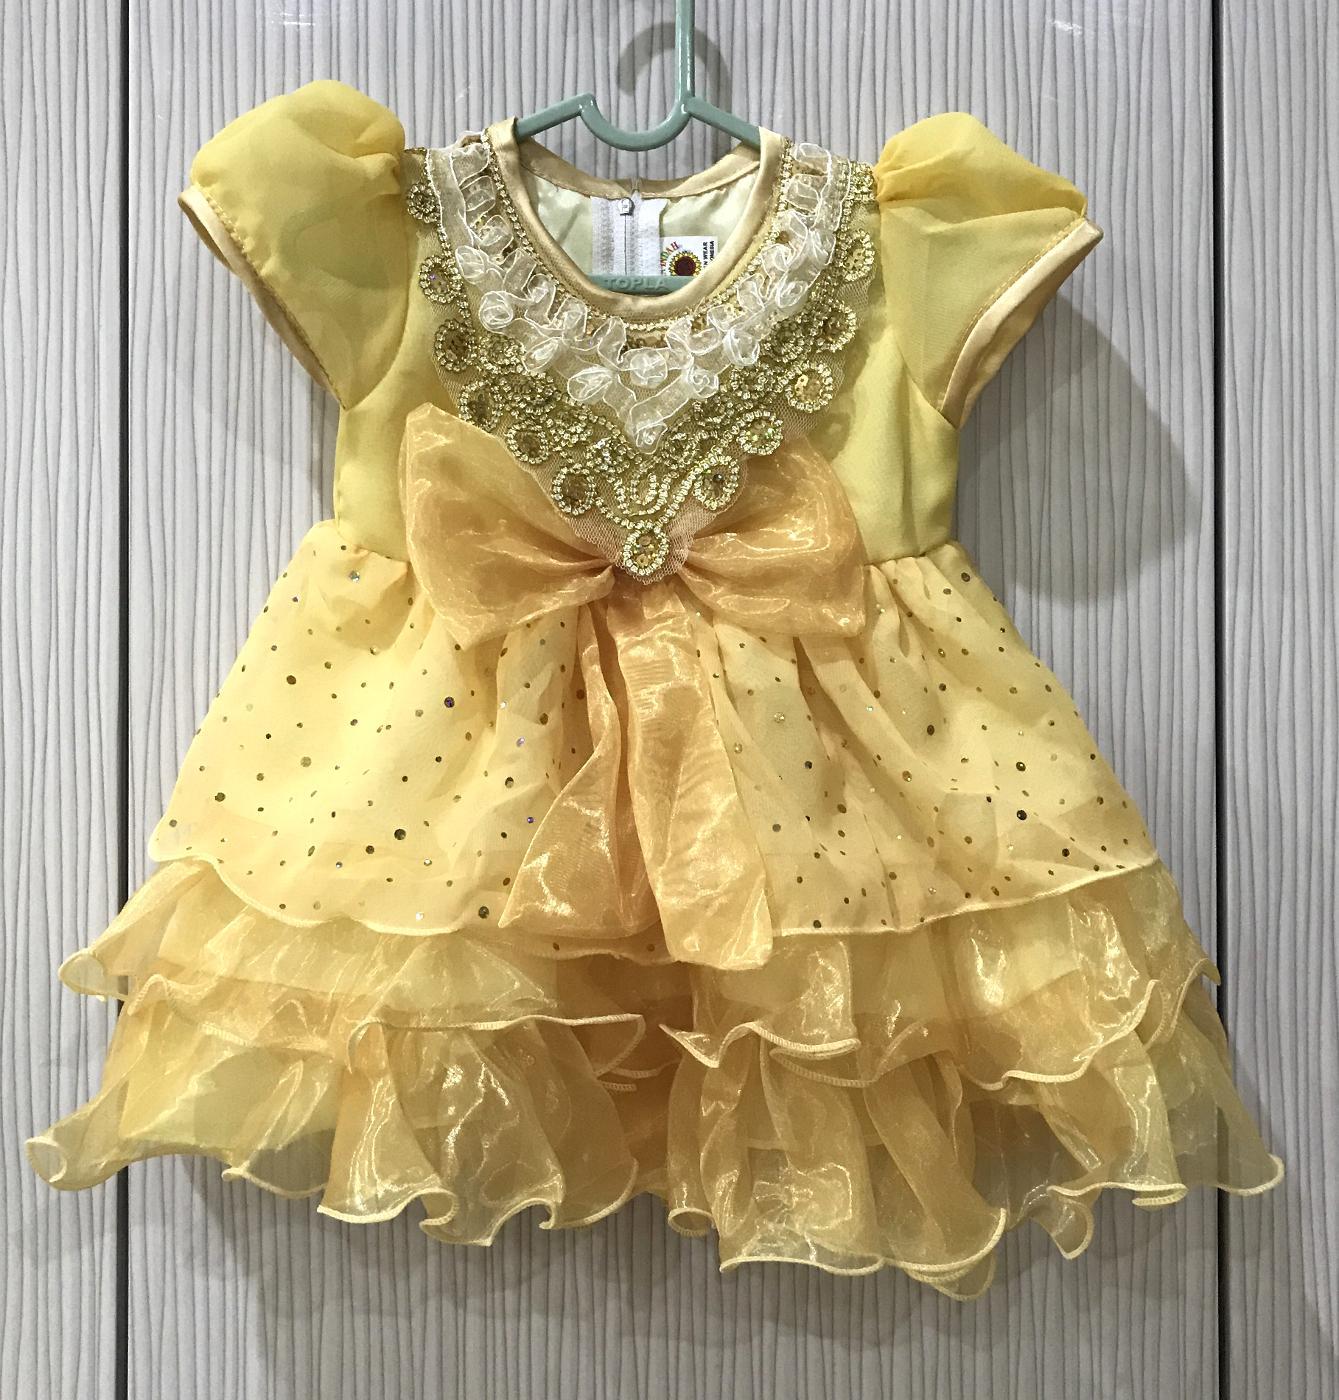 Cek Harga Baru Bayie Baju Bayi Pesta Anak Perempuan Model Pita Besar